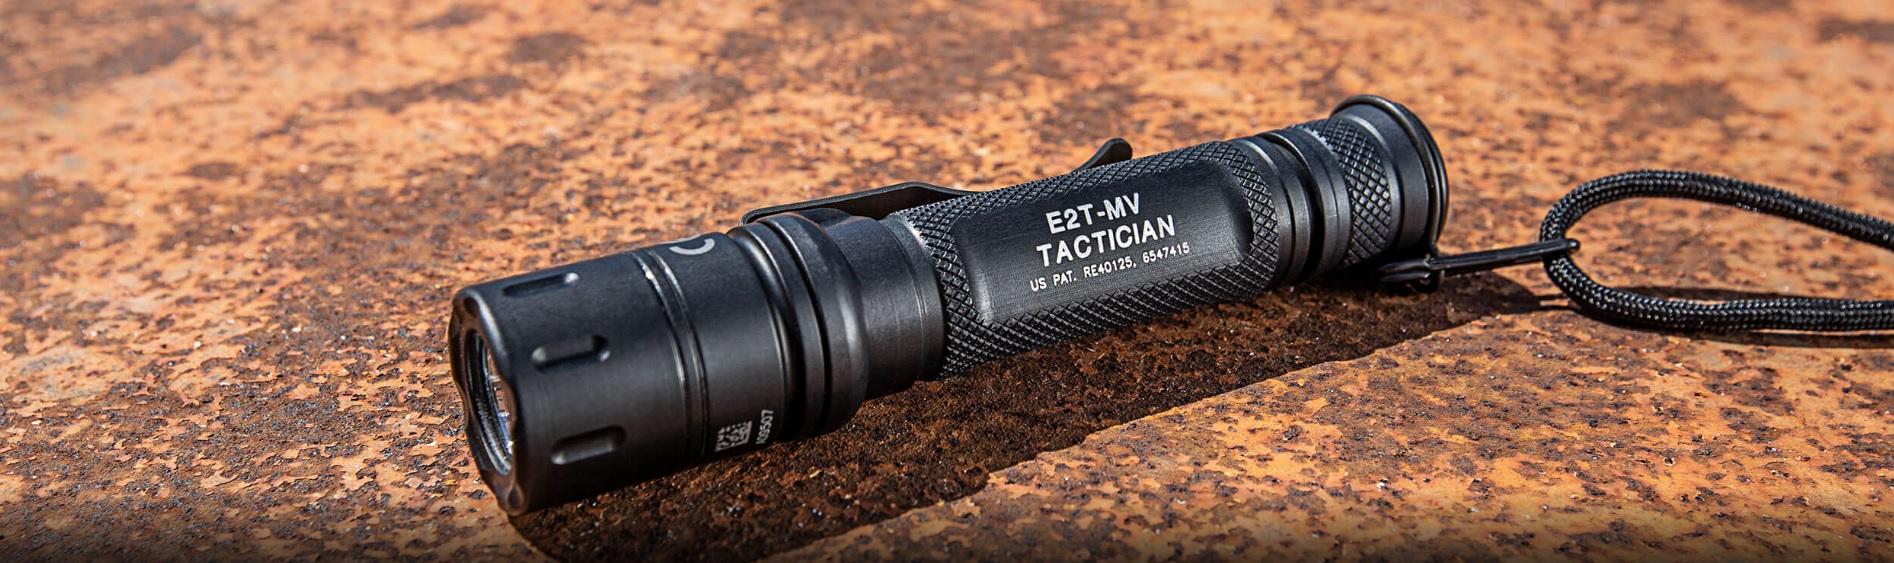 SUREFIRE-E2T-MV-TACTICIAN-Dual-Output-MaxVision-Beam-LED-Flashlight-BANNER